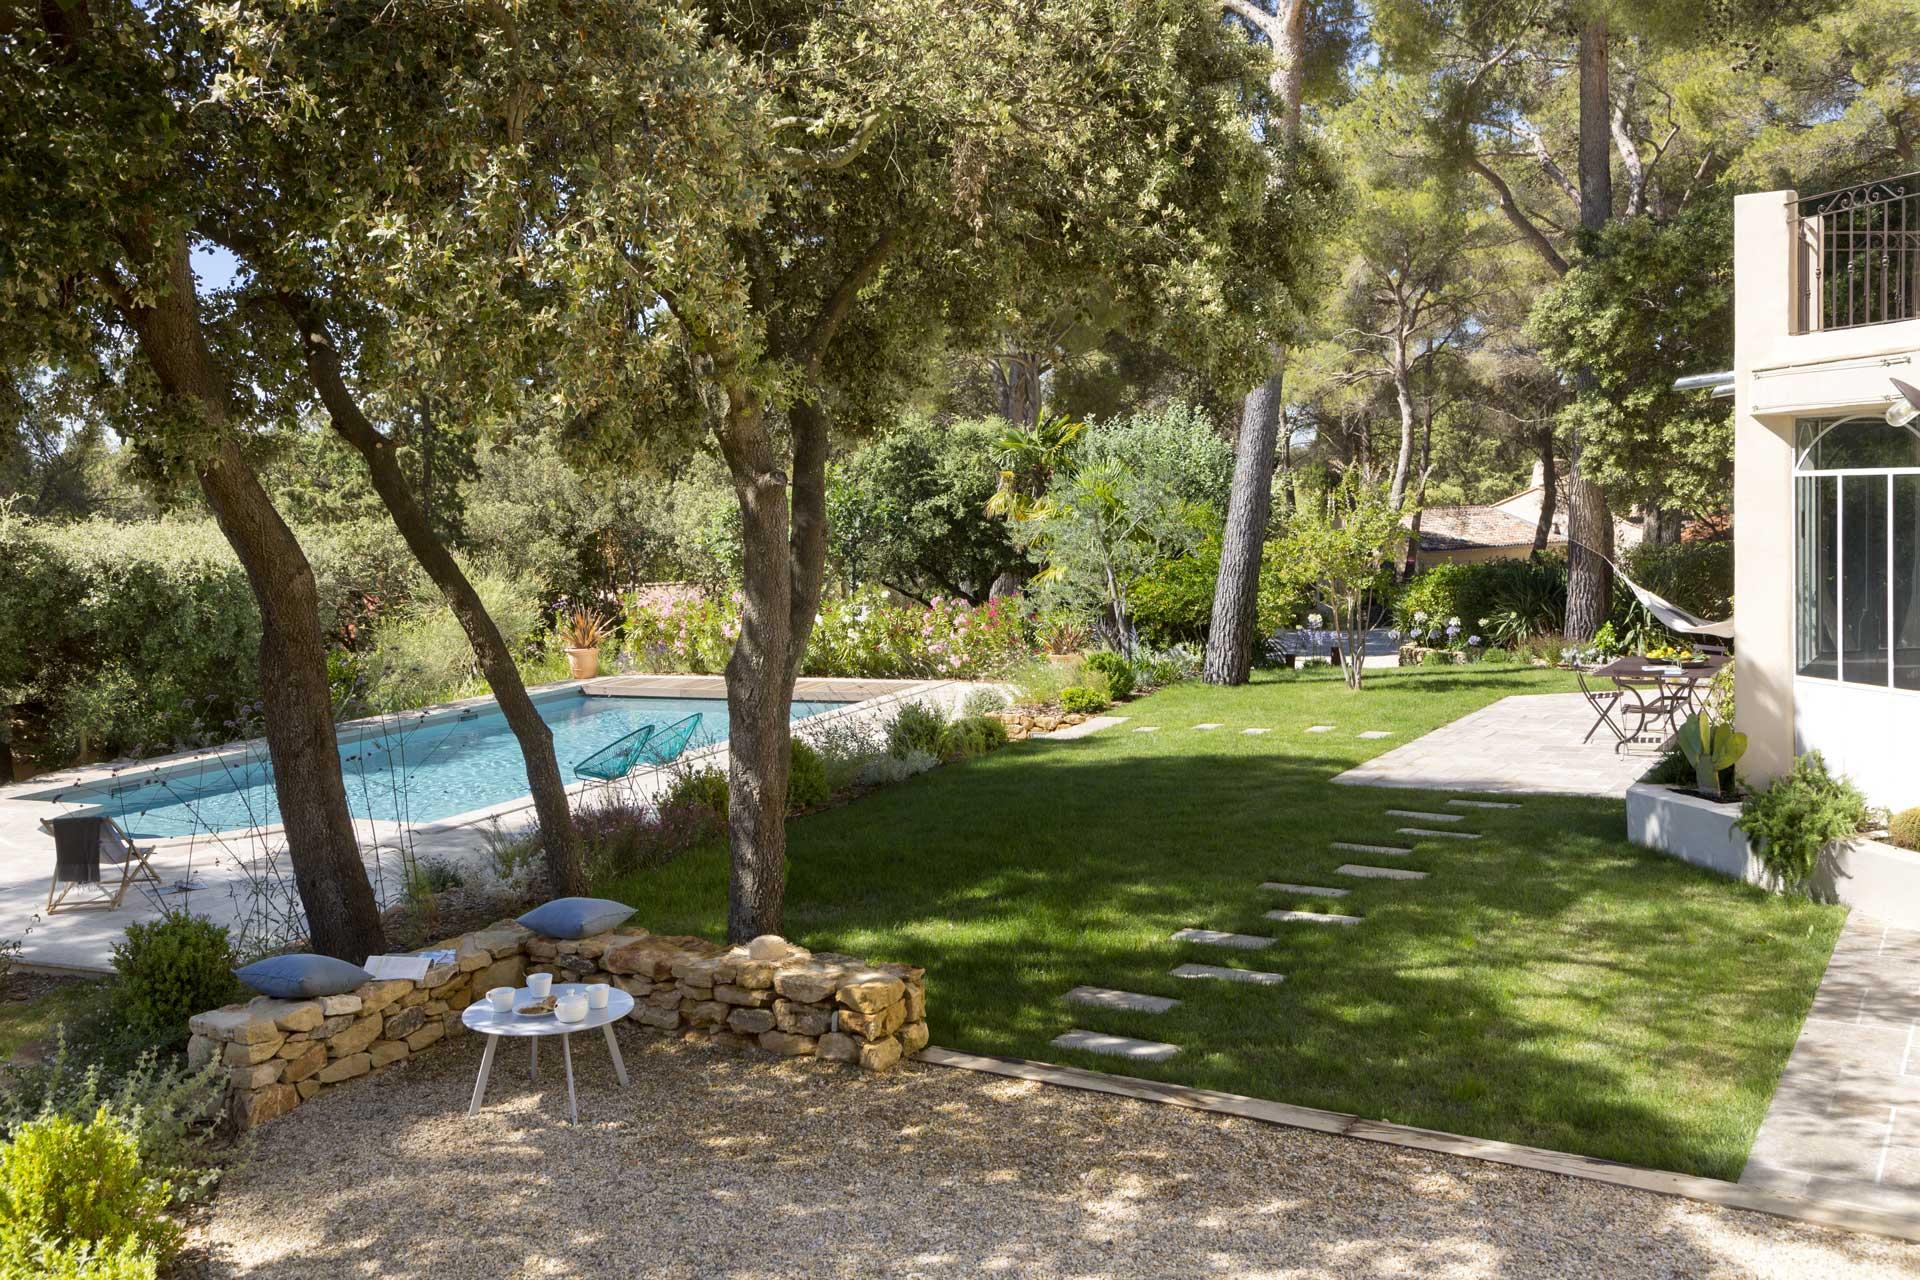 jardin-provence-mediterraneen-saint-marc-jaumegarde Réalisation Morvan et Moingeon